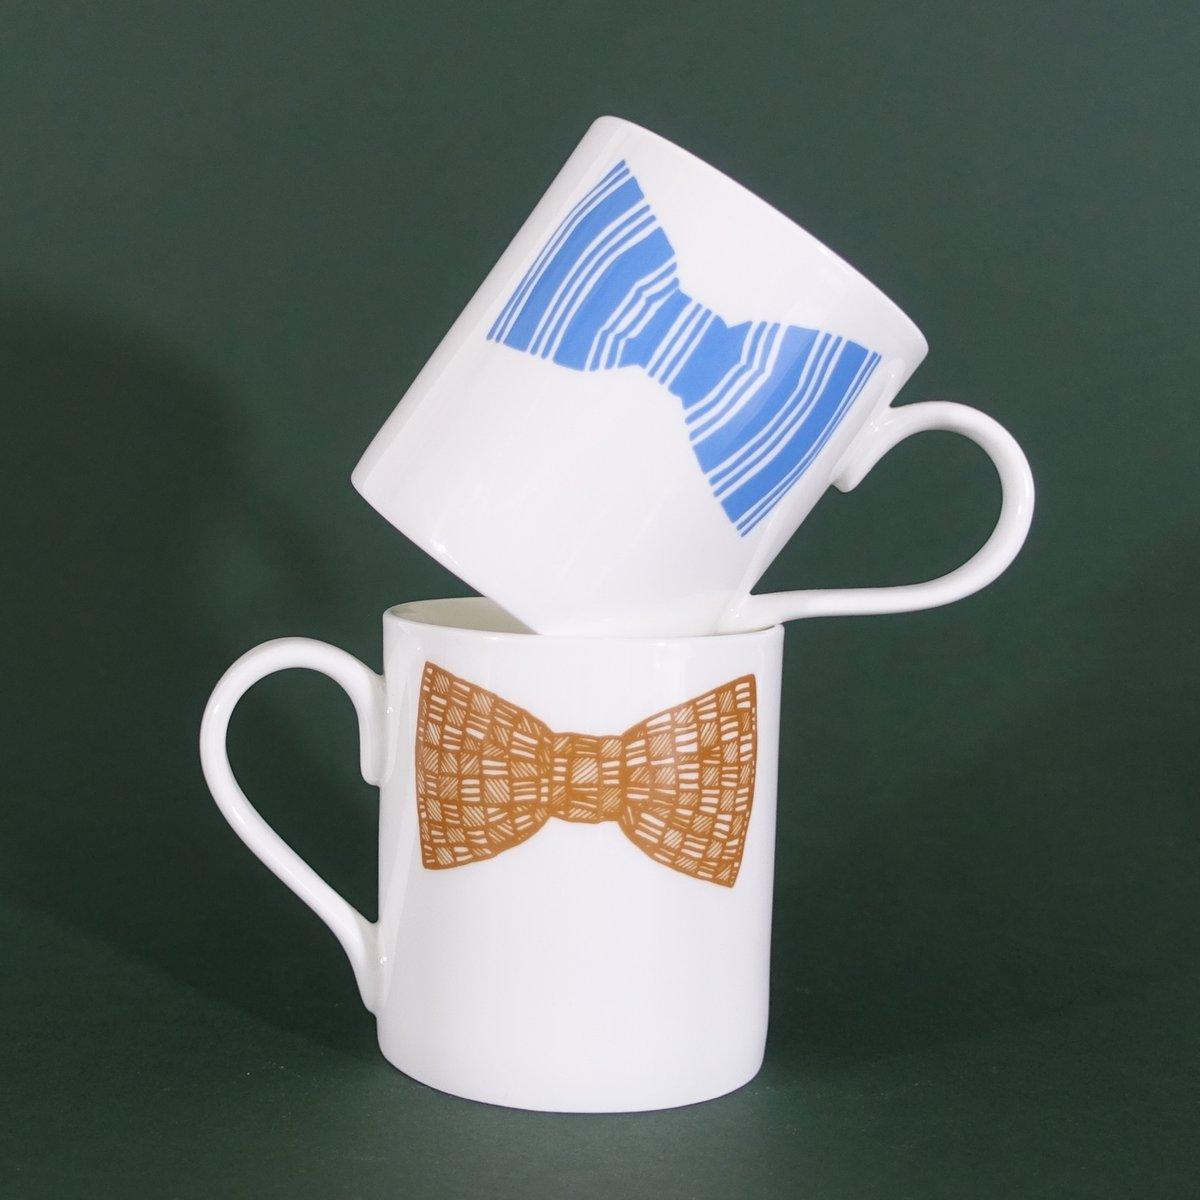 Image of Original Bow tie Mug - Set Of Two (Blue & Mustard Double Print)